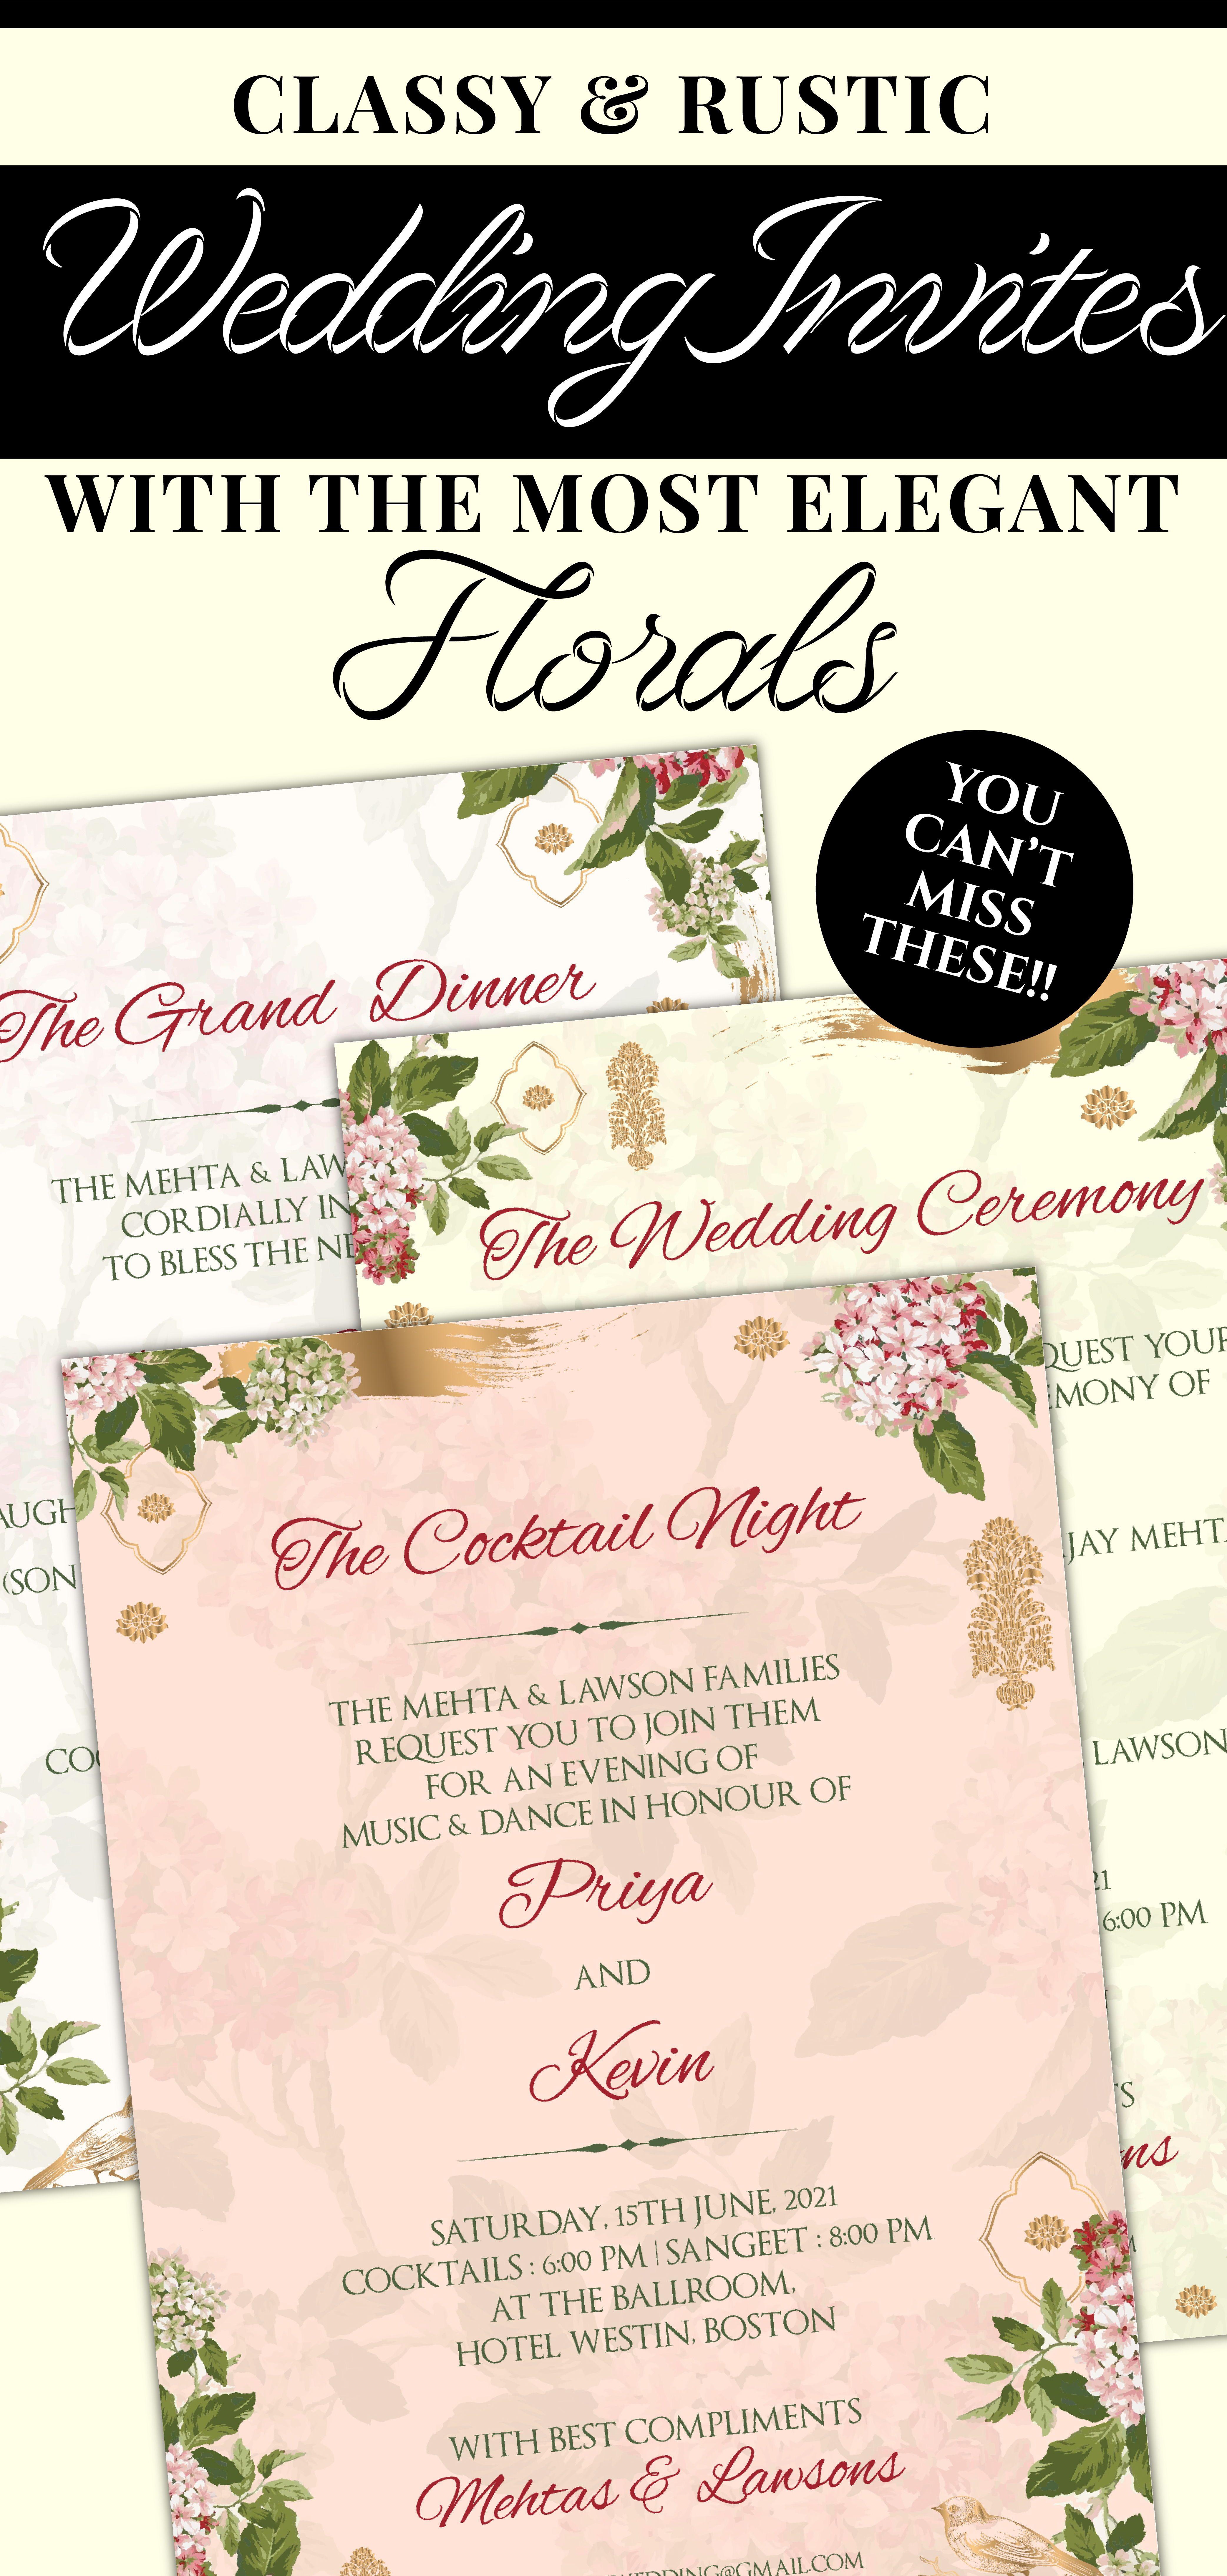 Wedding Invites Boho As Boho Flower Wedding Card Garden Boho Etsy Indian Wedding Invitations Indian Wedding Cards Wedding Cards